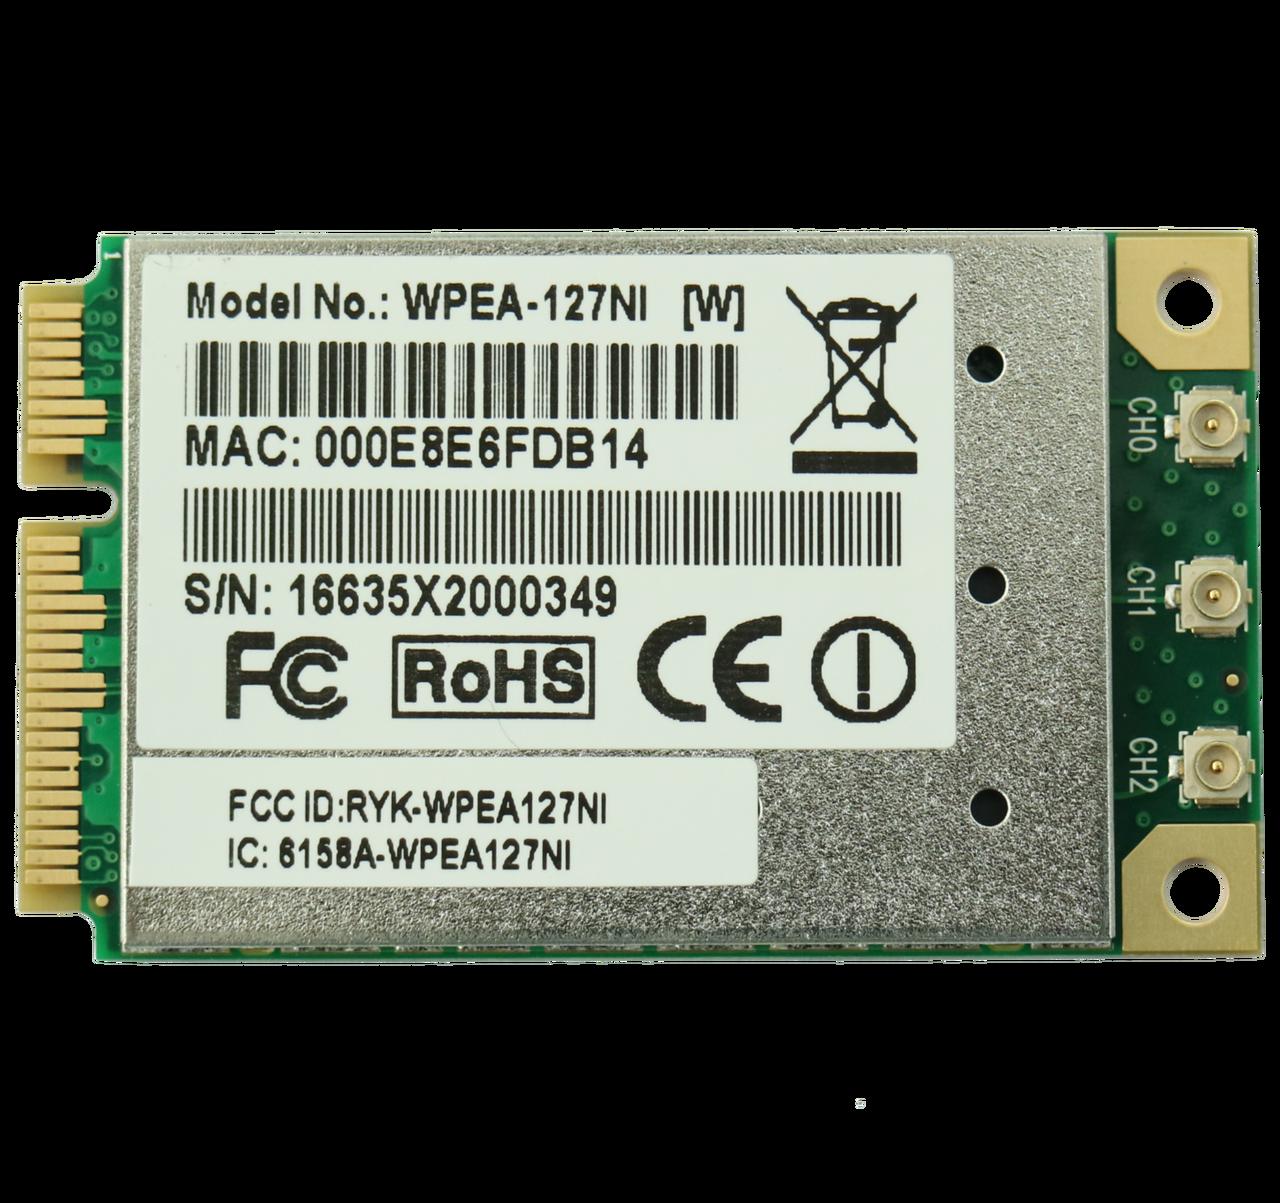 WPEA-127NI 802 11a/b/g/n Industrial-Grade Mini PCIe Module, Atheros